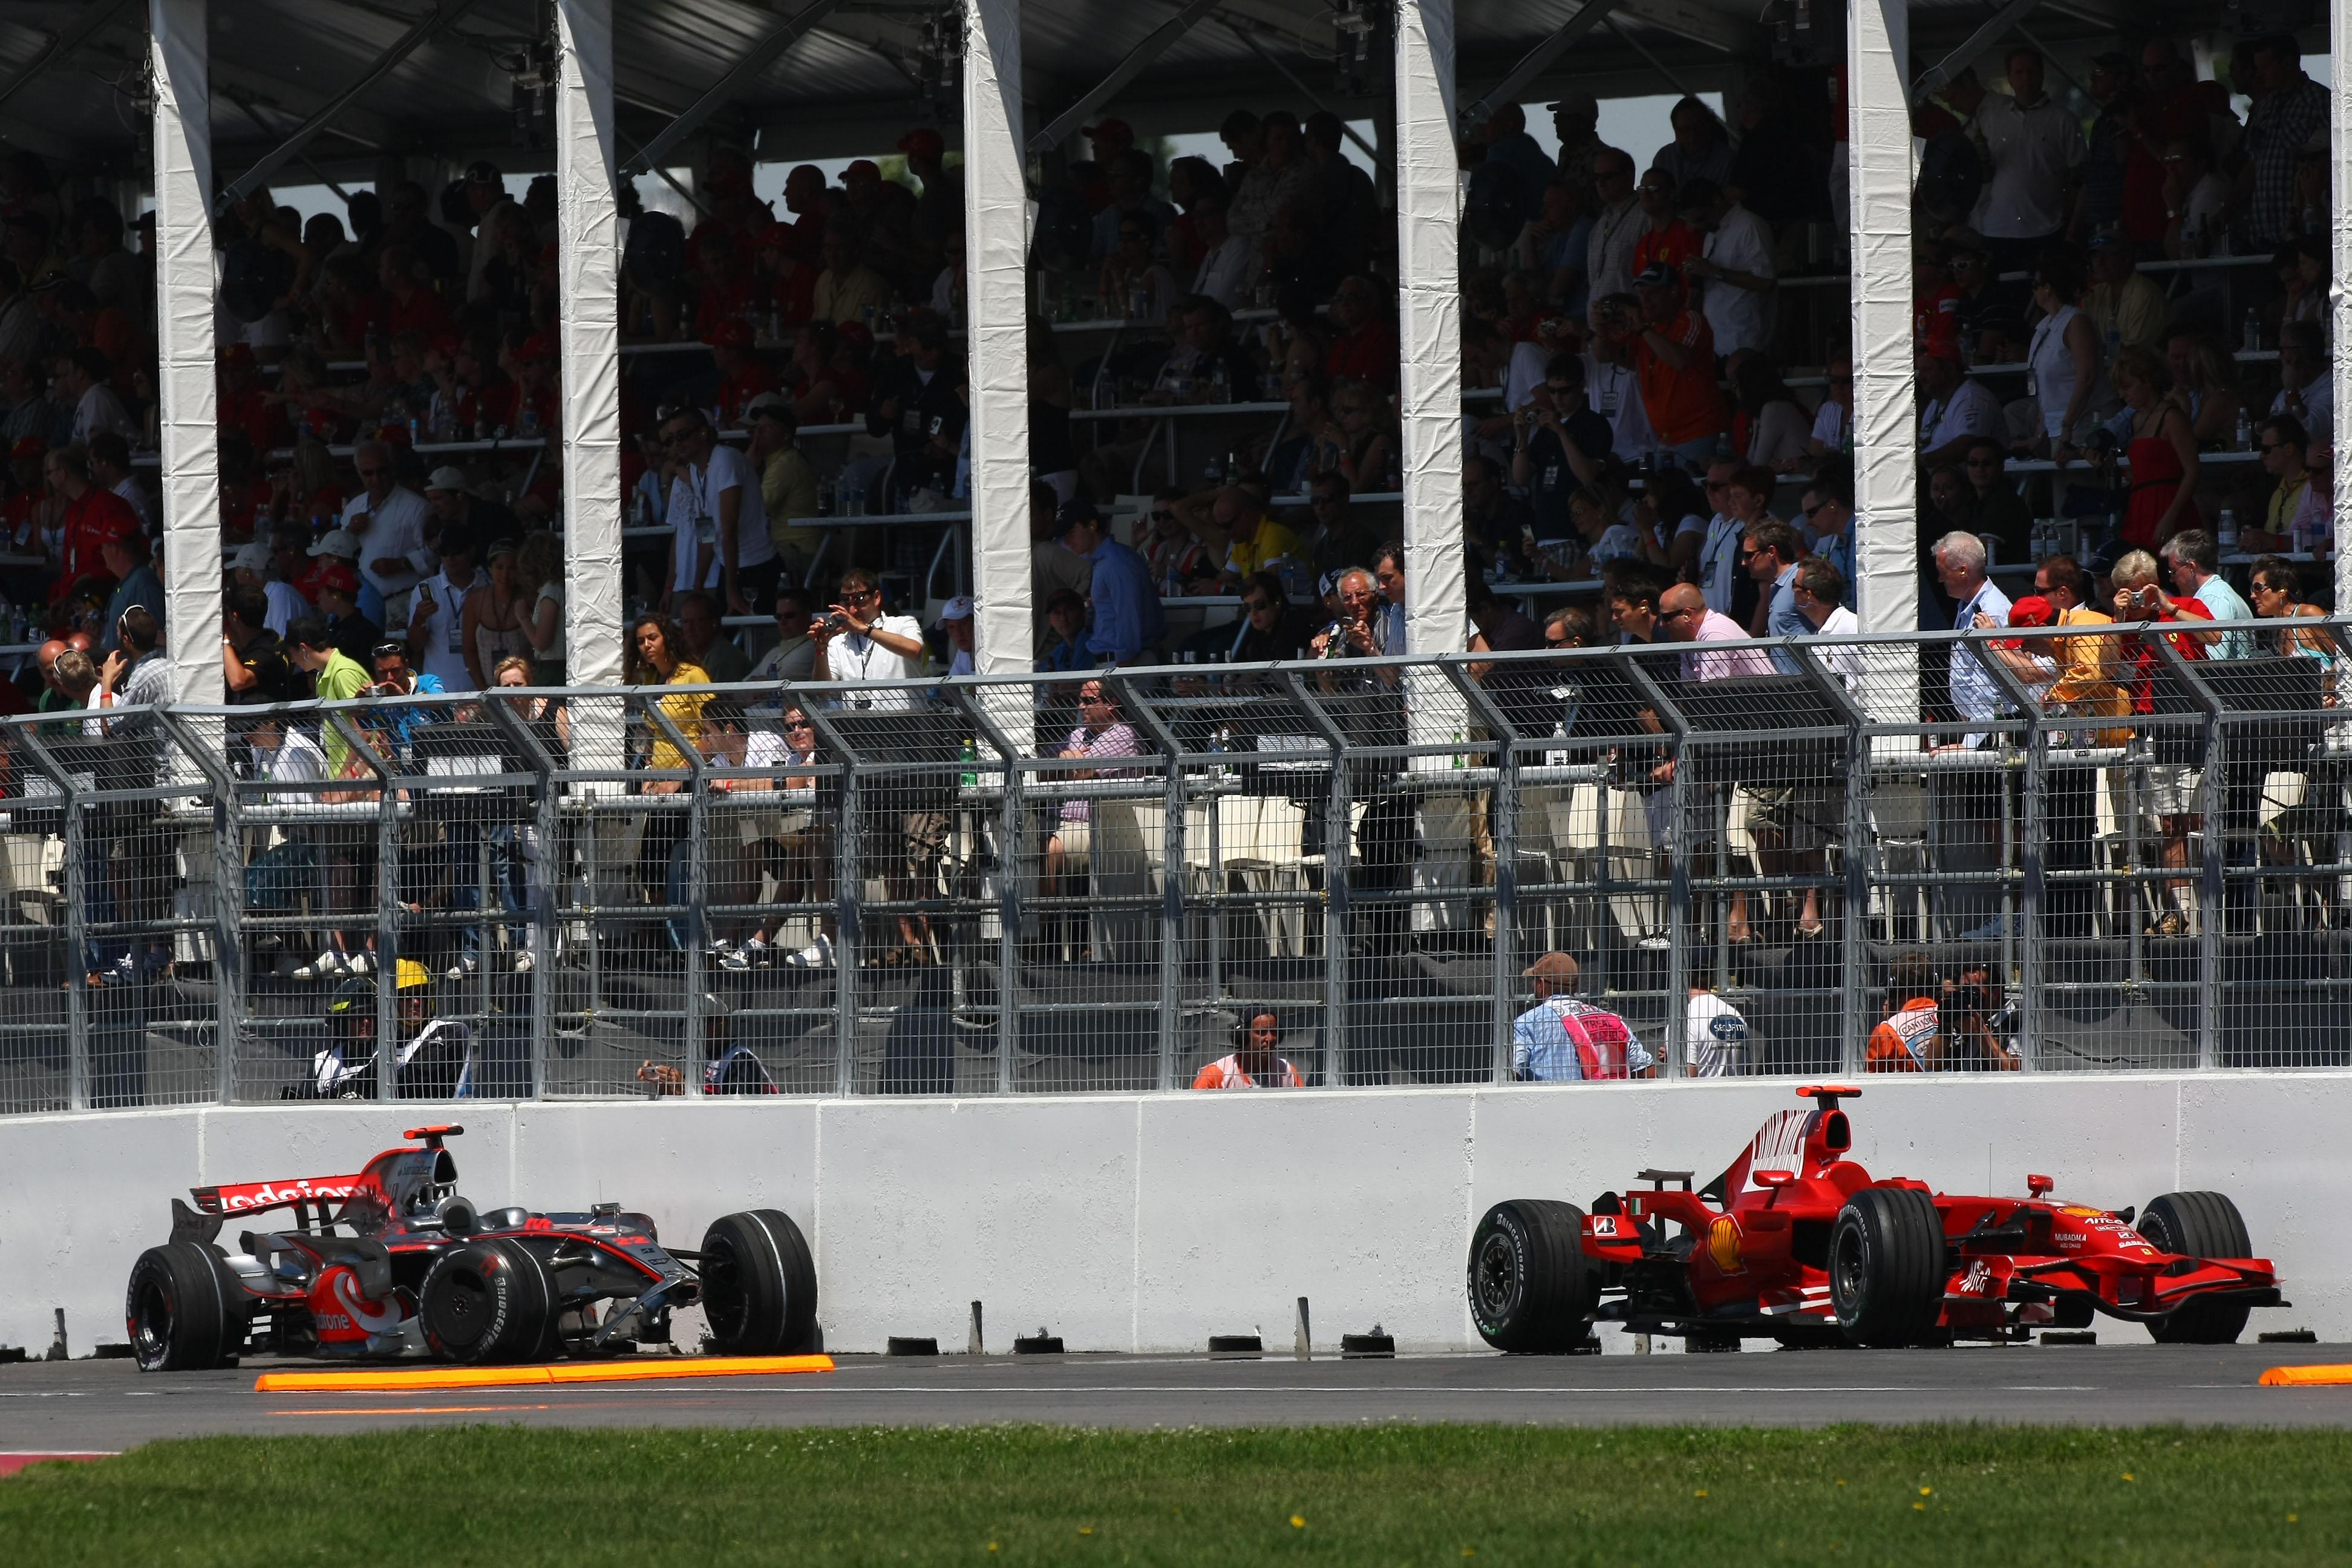 Formula 1 Grand Prix, Canada, Sunday Race